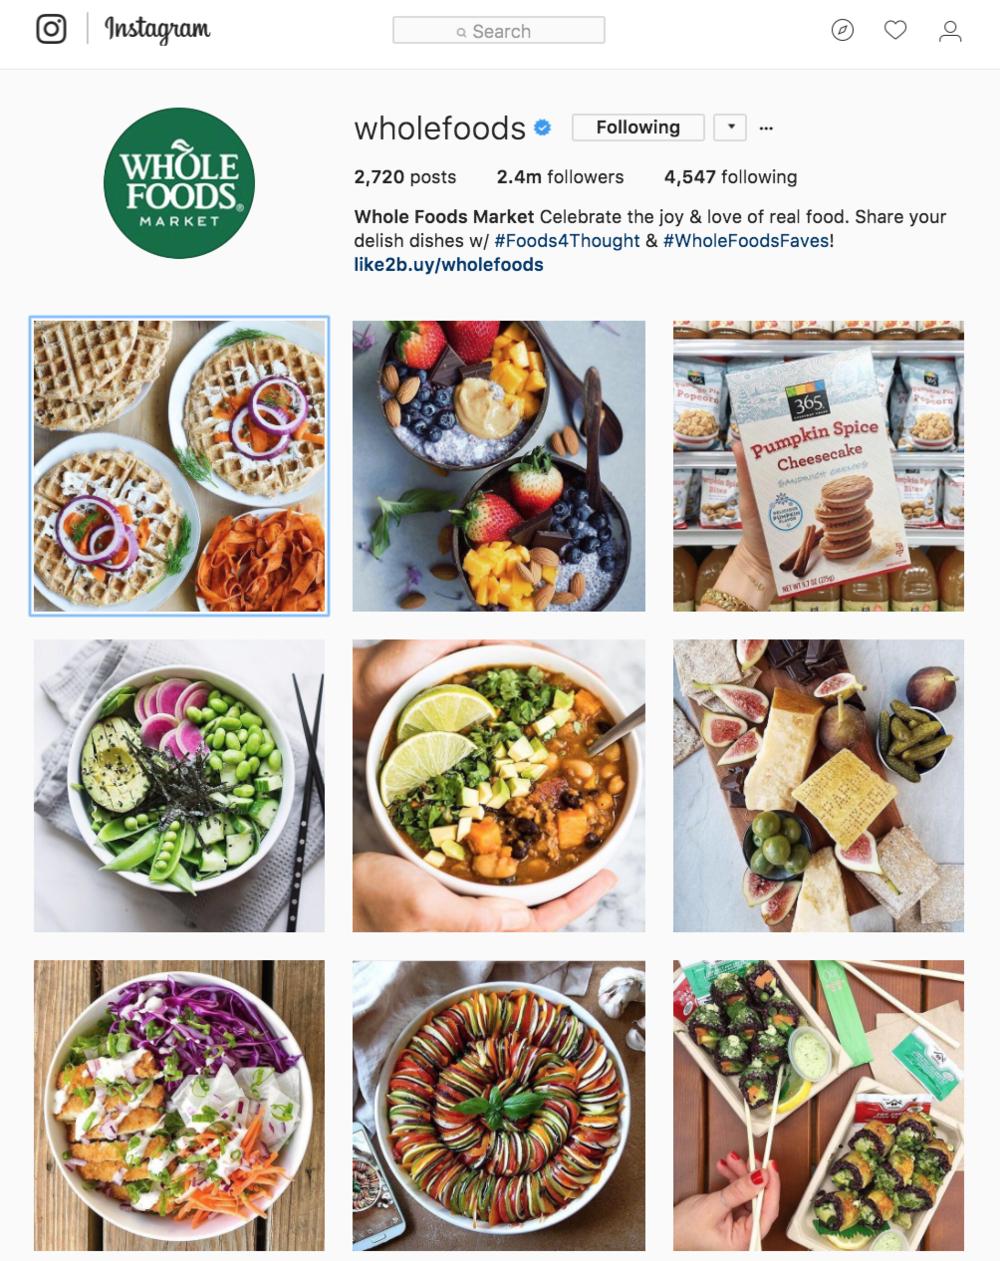 Whole Foods Market Instagram, instagram.com/wholefoods.